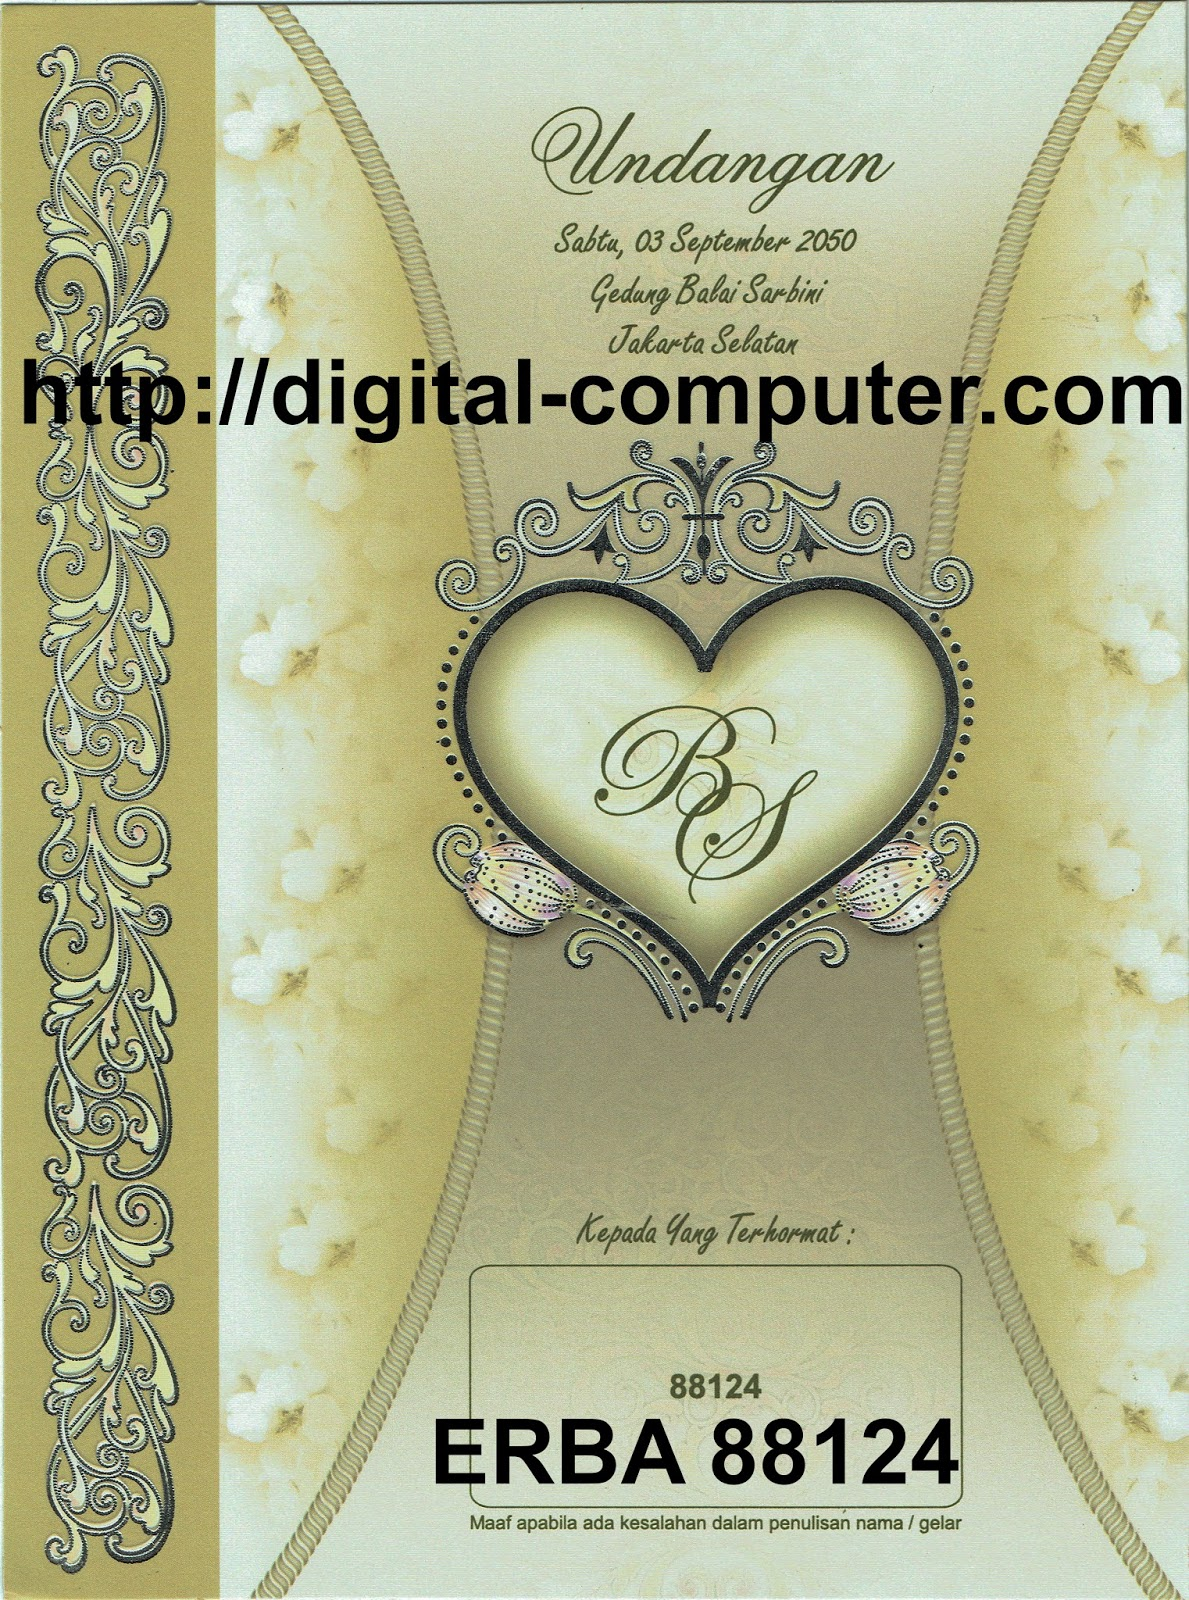 Undangan Softcover ERBA 88124